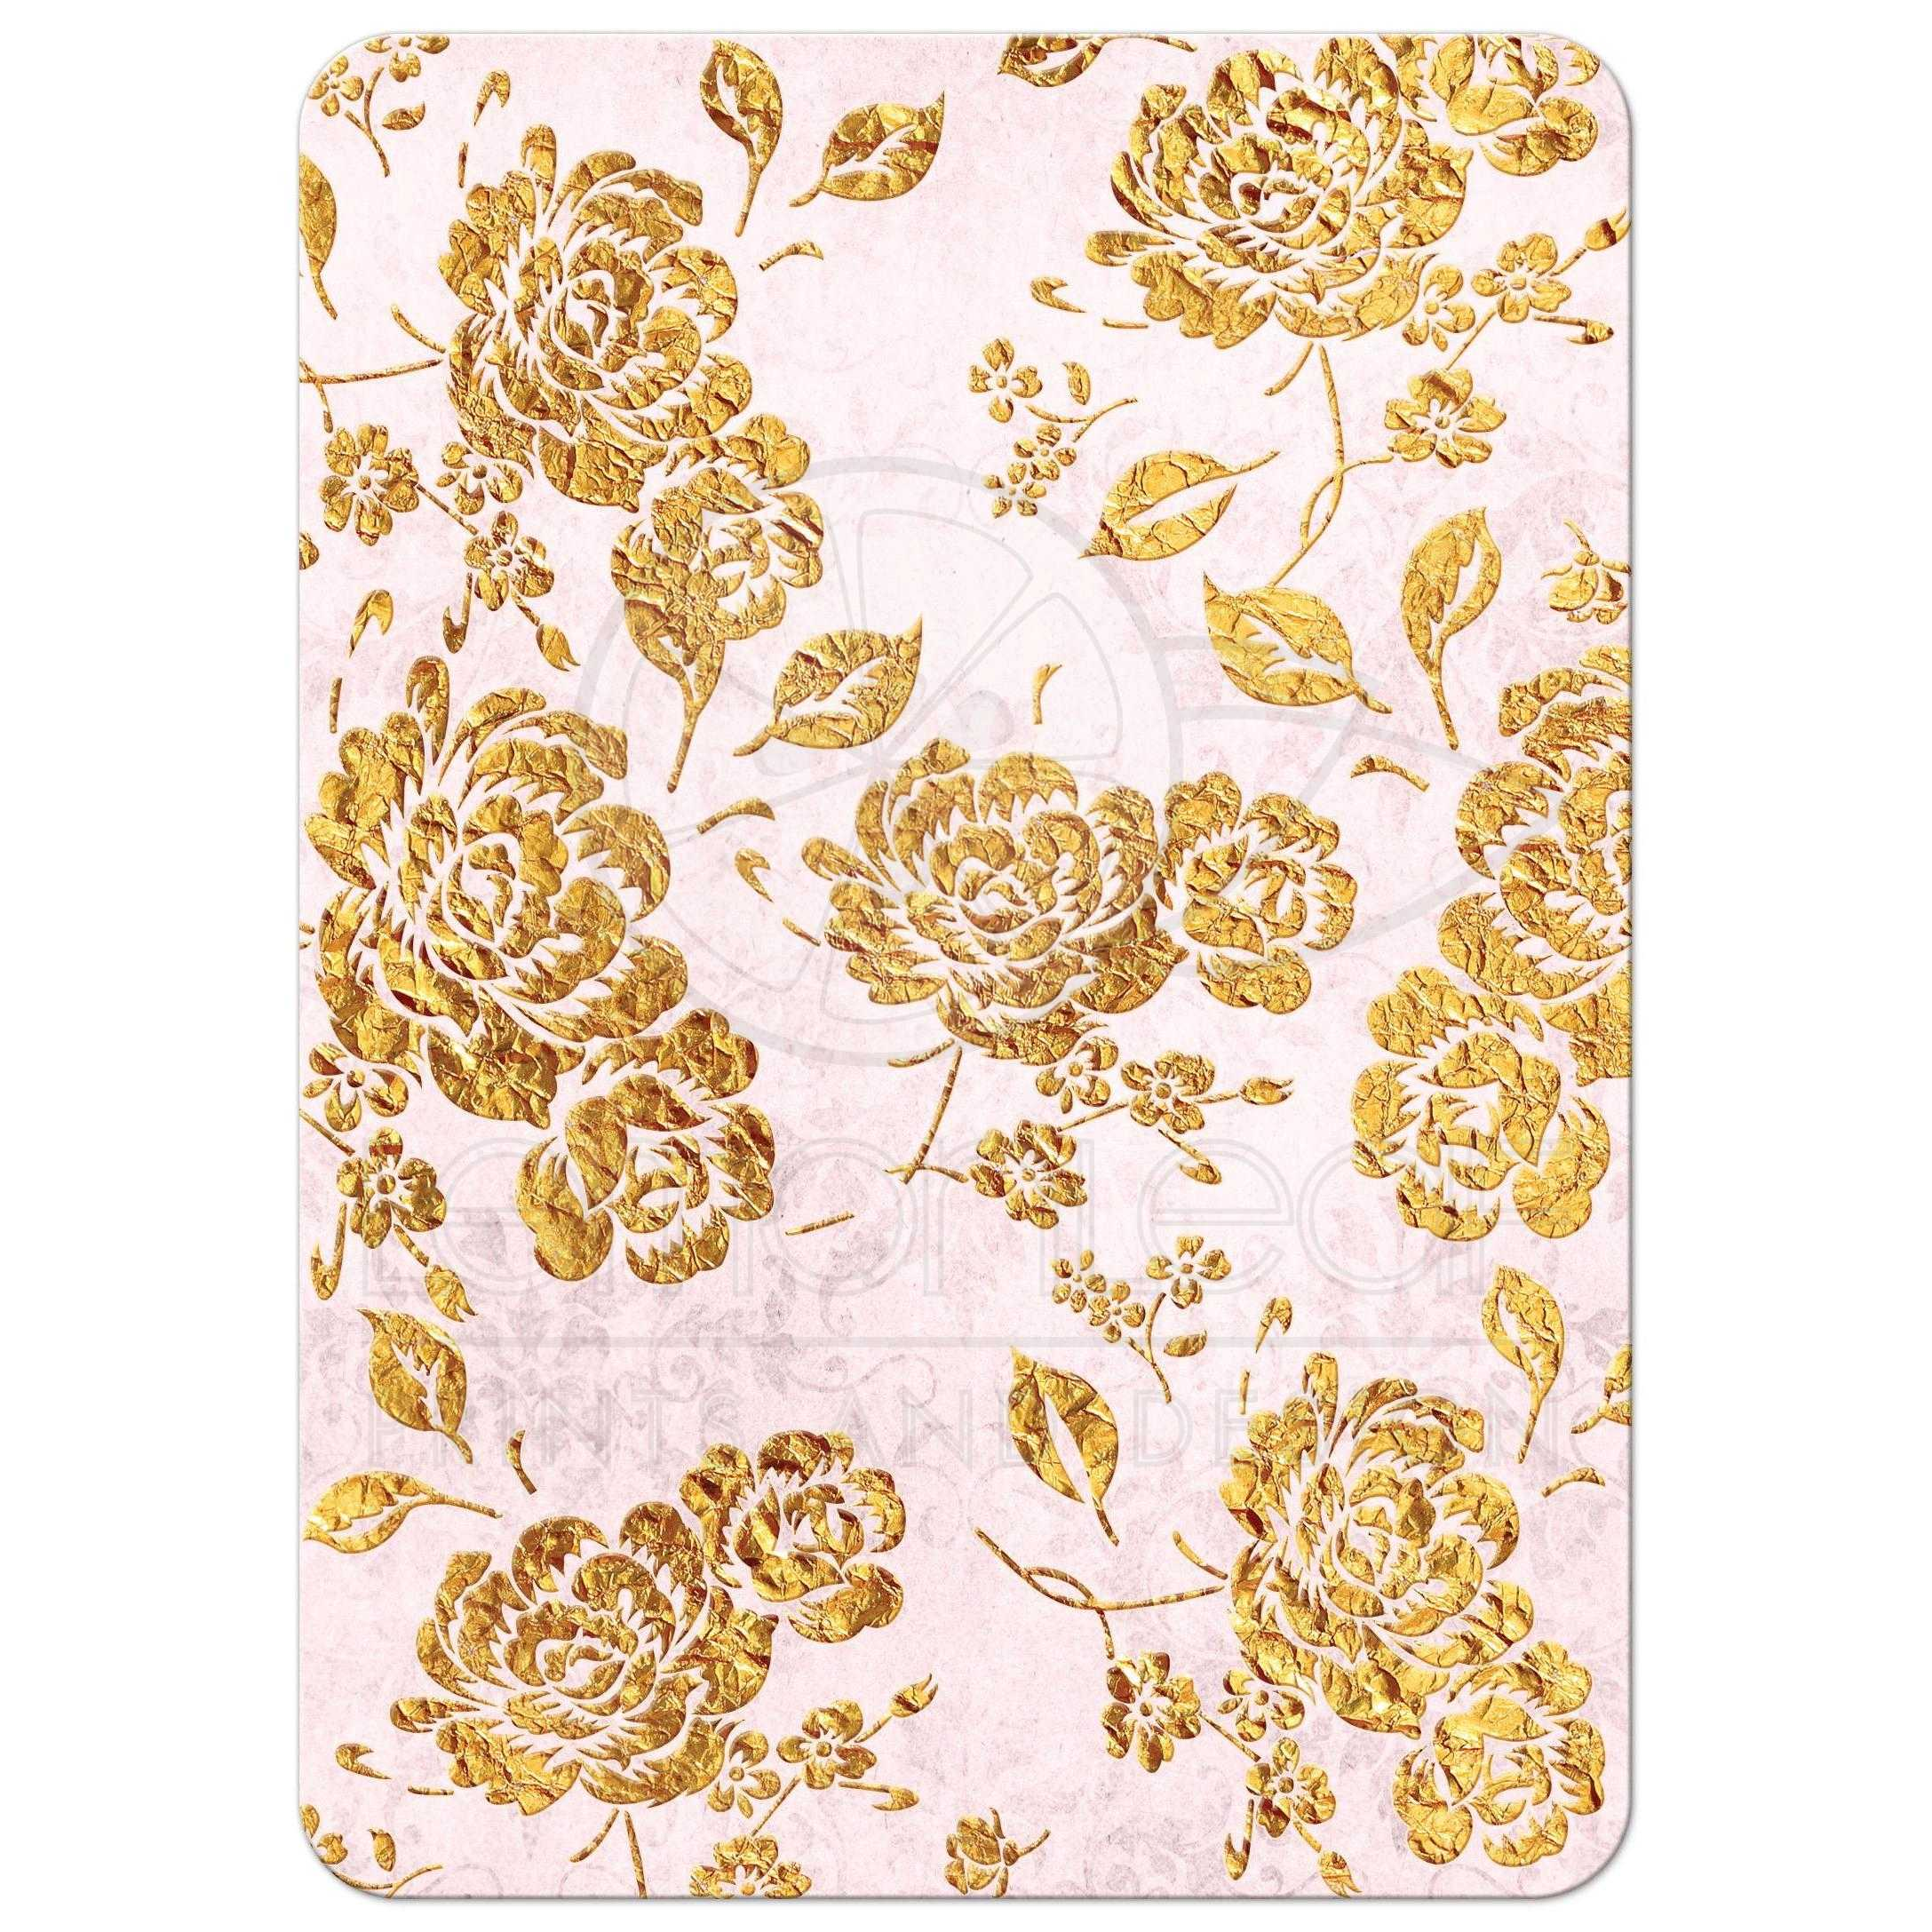 Wall Stickers Decor Modern Wedding Invitation Vintage Floral Blush Pink Ivory